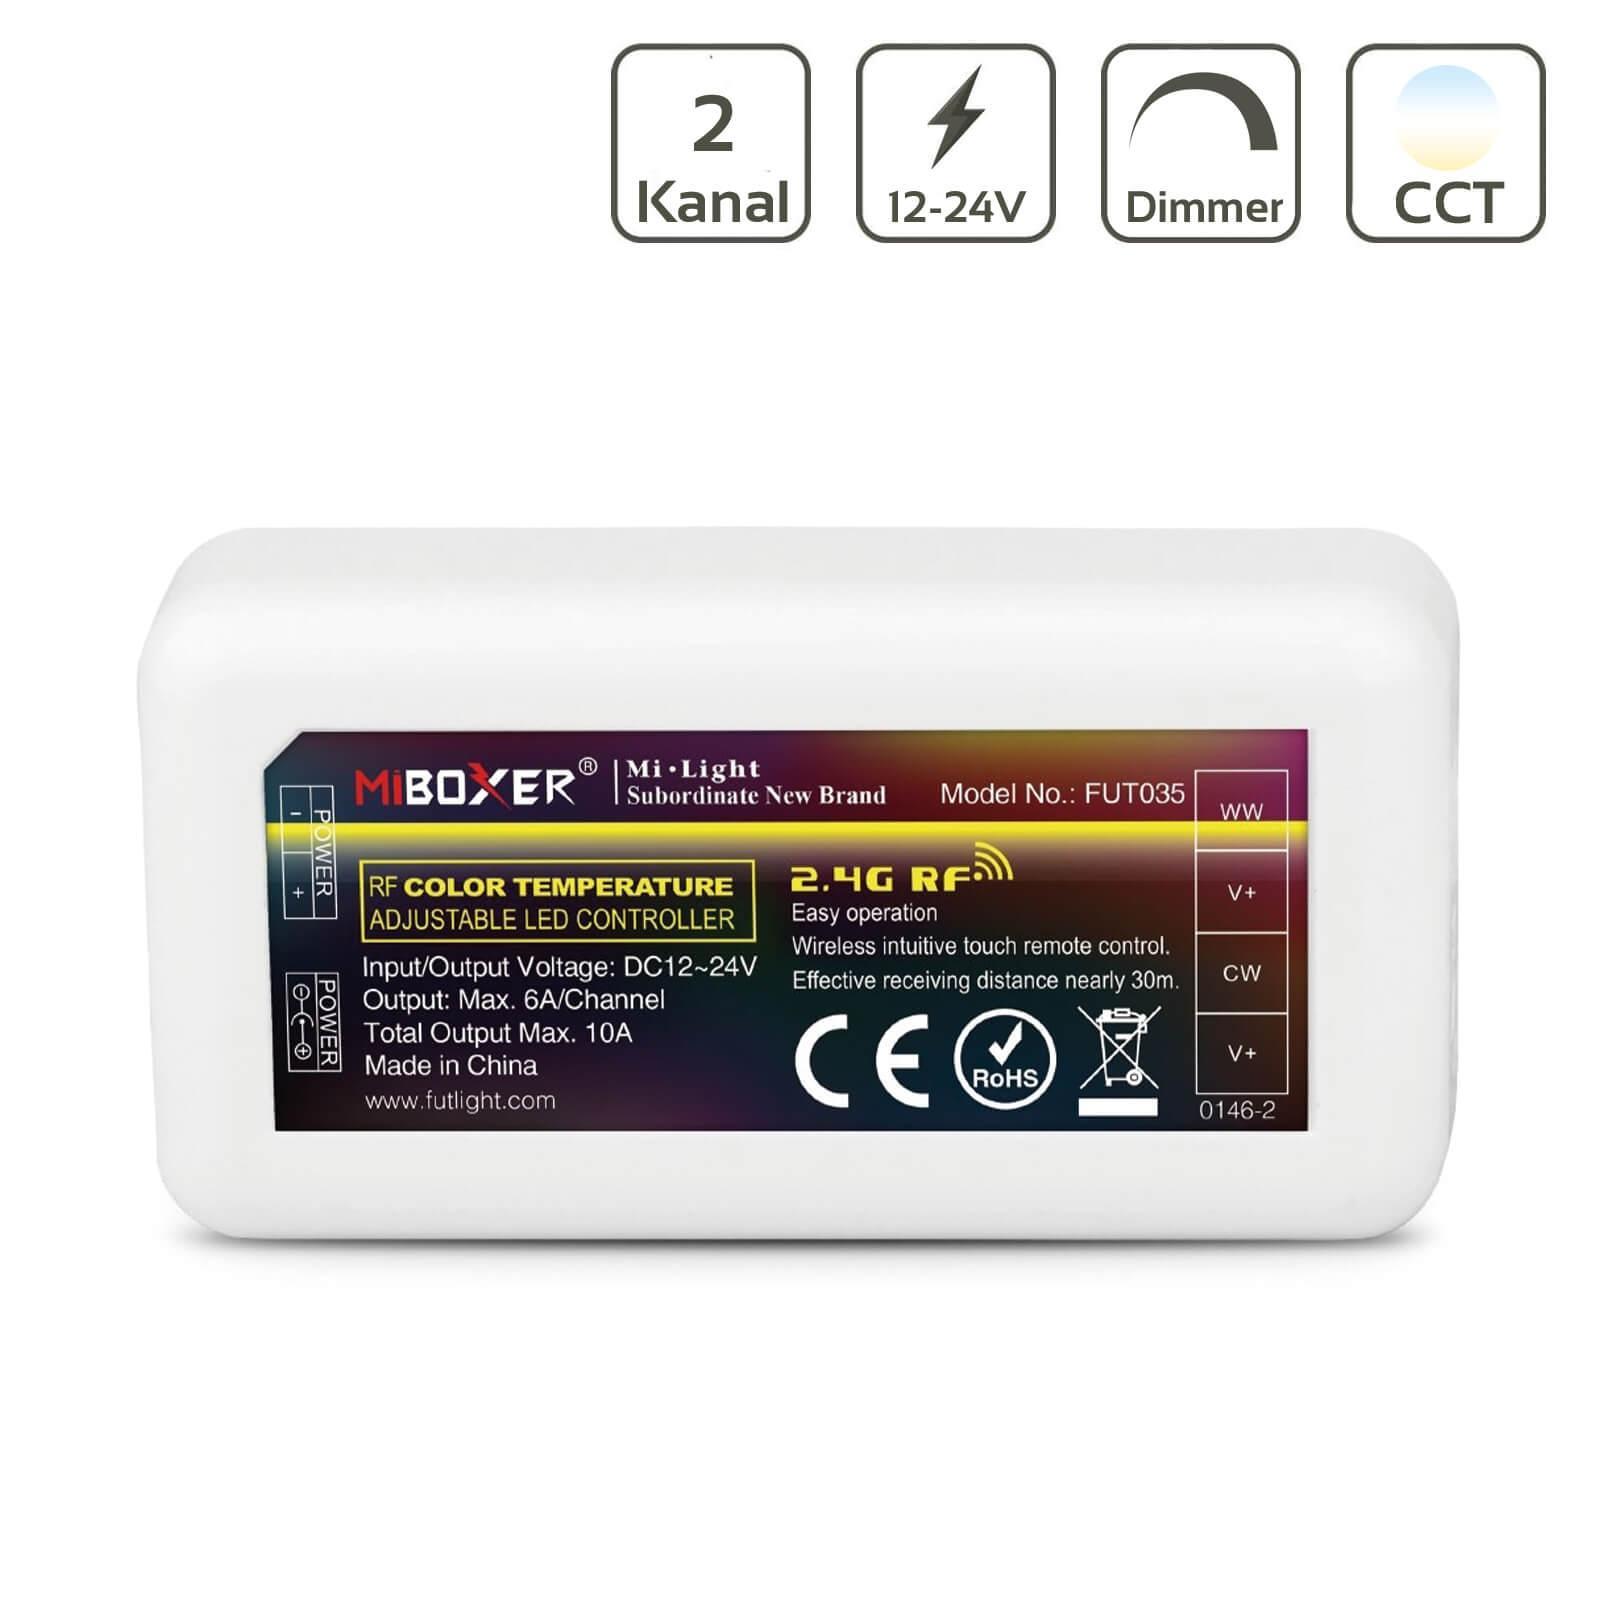 MiBoxer CCT LED Controller 2 Kanal 12/24V Multifunktion LED Strip Panel Steuerung FUT035